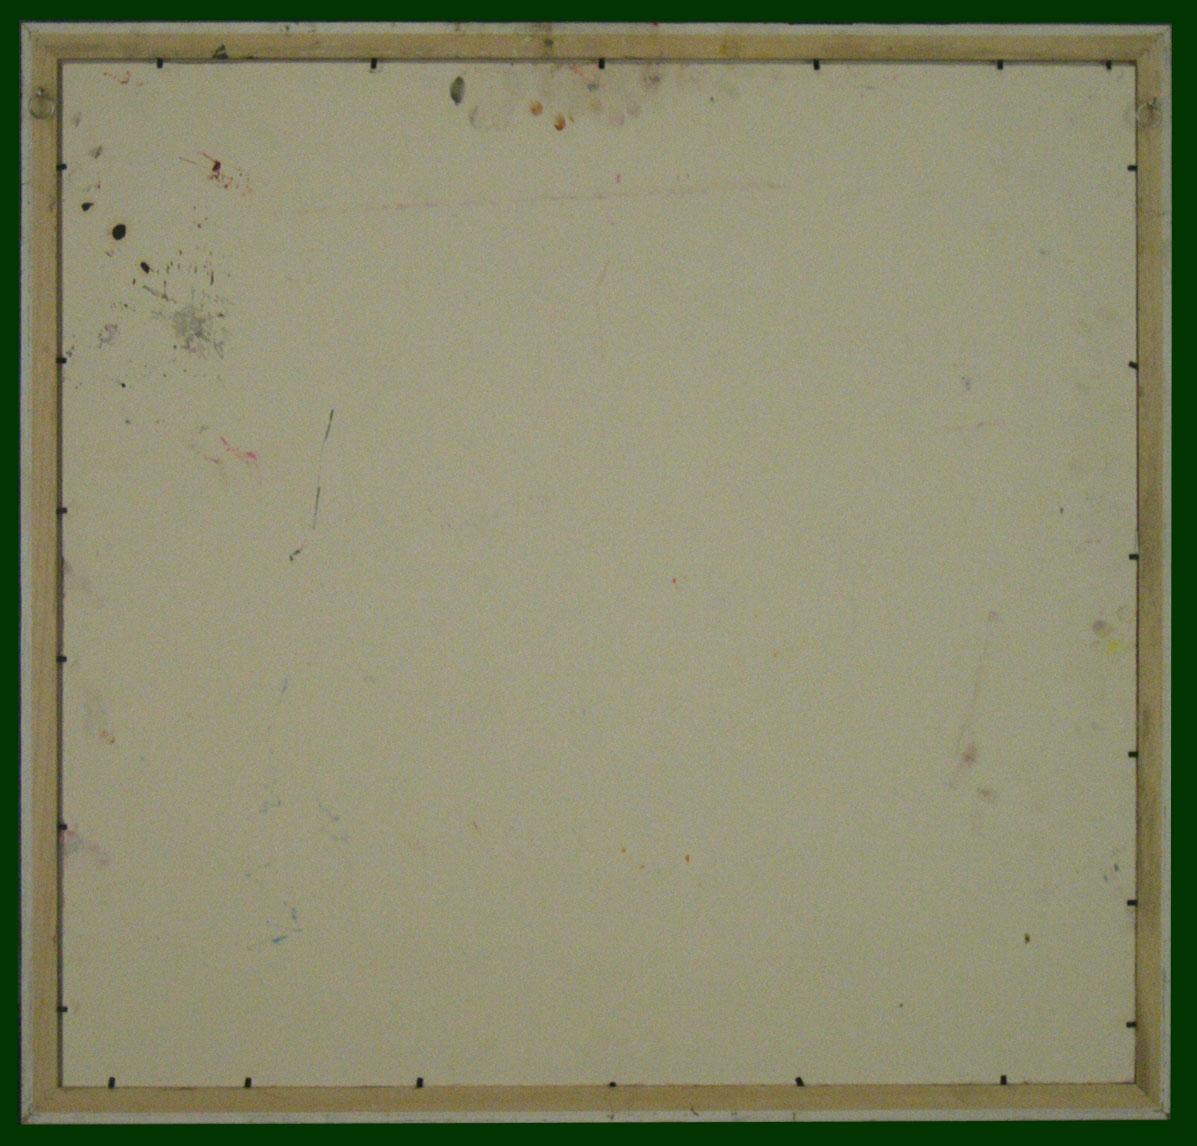 013-012hat.JPG (1197×1146)